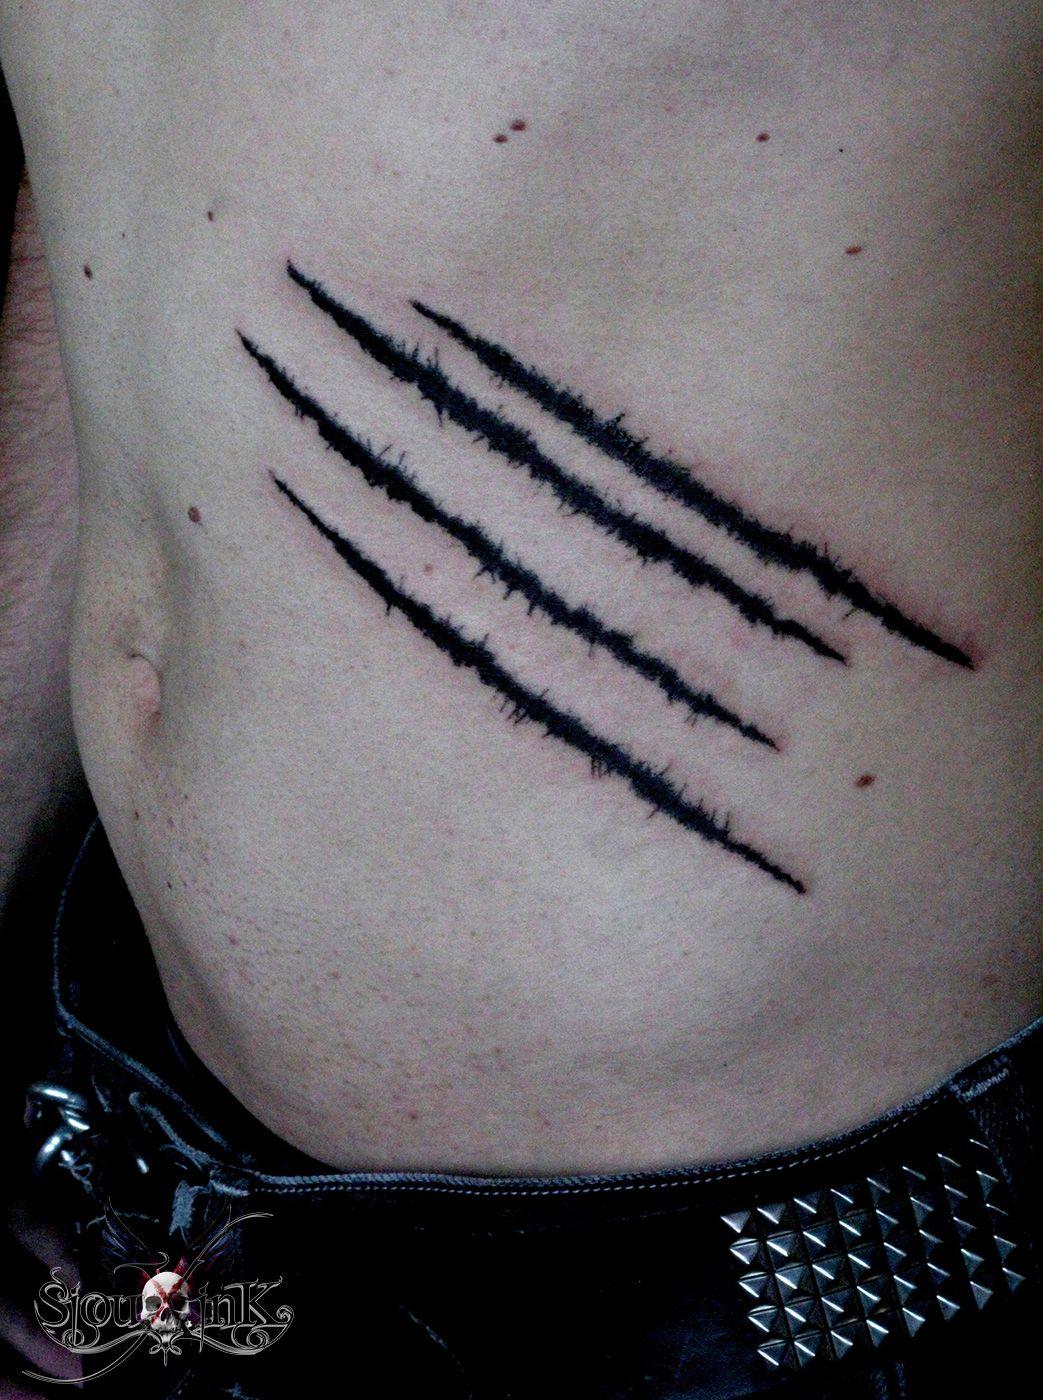 Claws tears tattoo siouxink tatouage paris tattoos pinterest claws tears tattoo siouxink tatouage paris altavistaventures Choice Image